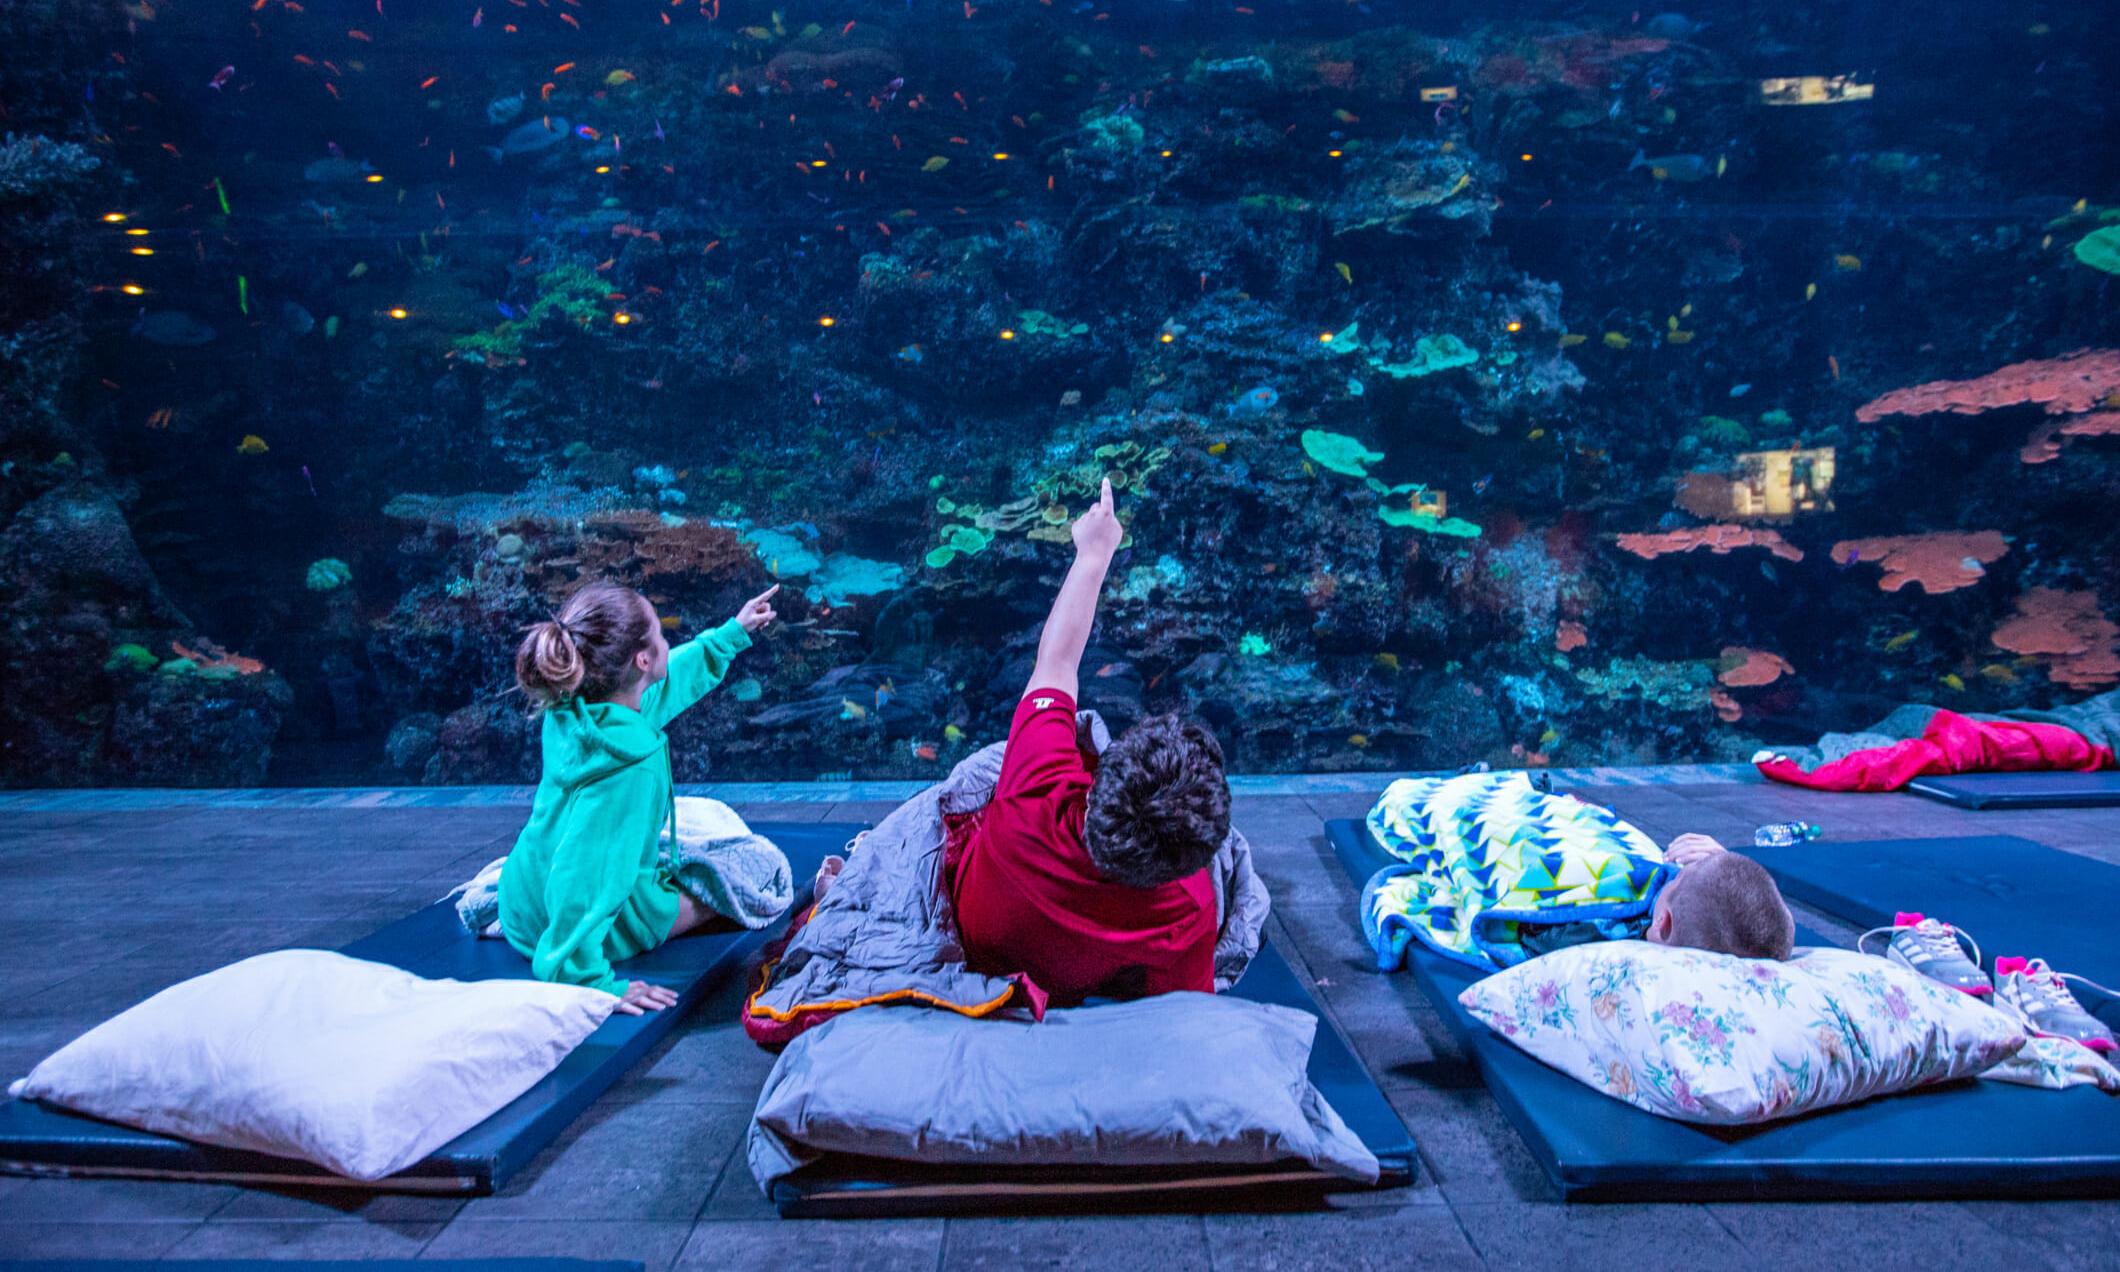 sleep-under-the-sea-10-1060x743@2x.jpg